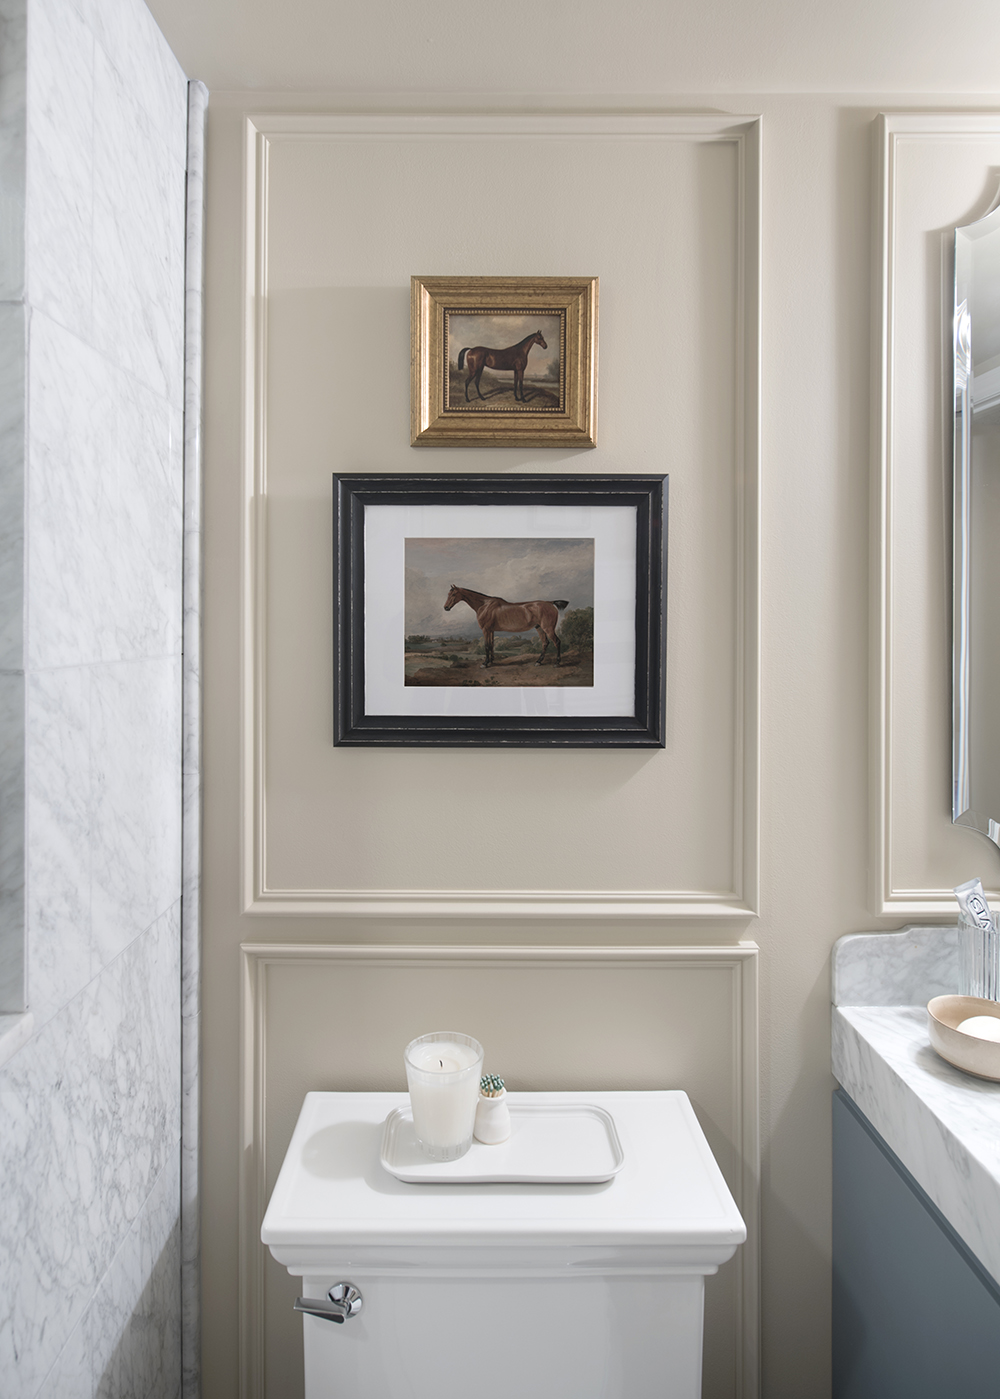 Basement Bathroom Reveal - roomfortuesday.com